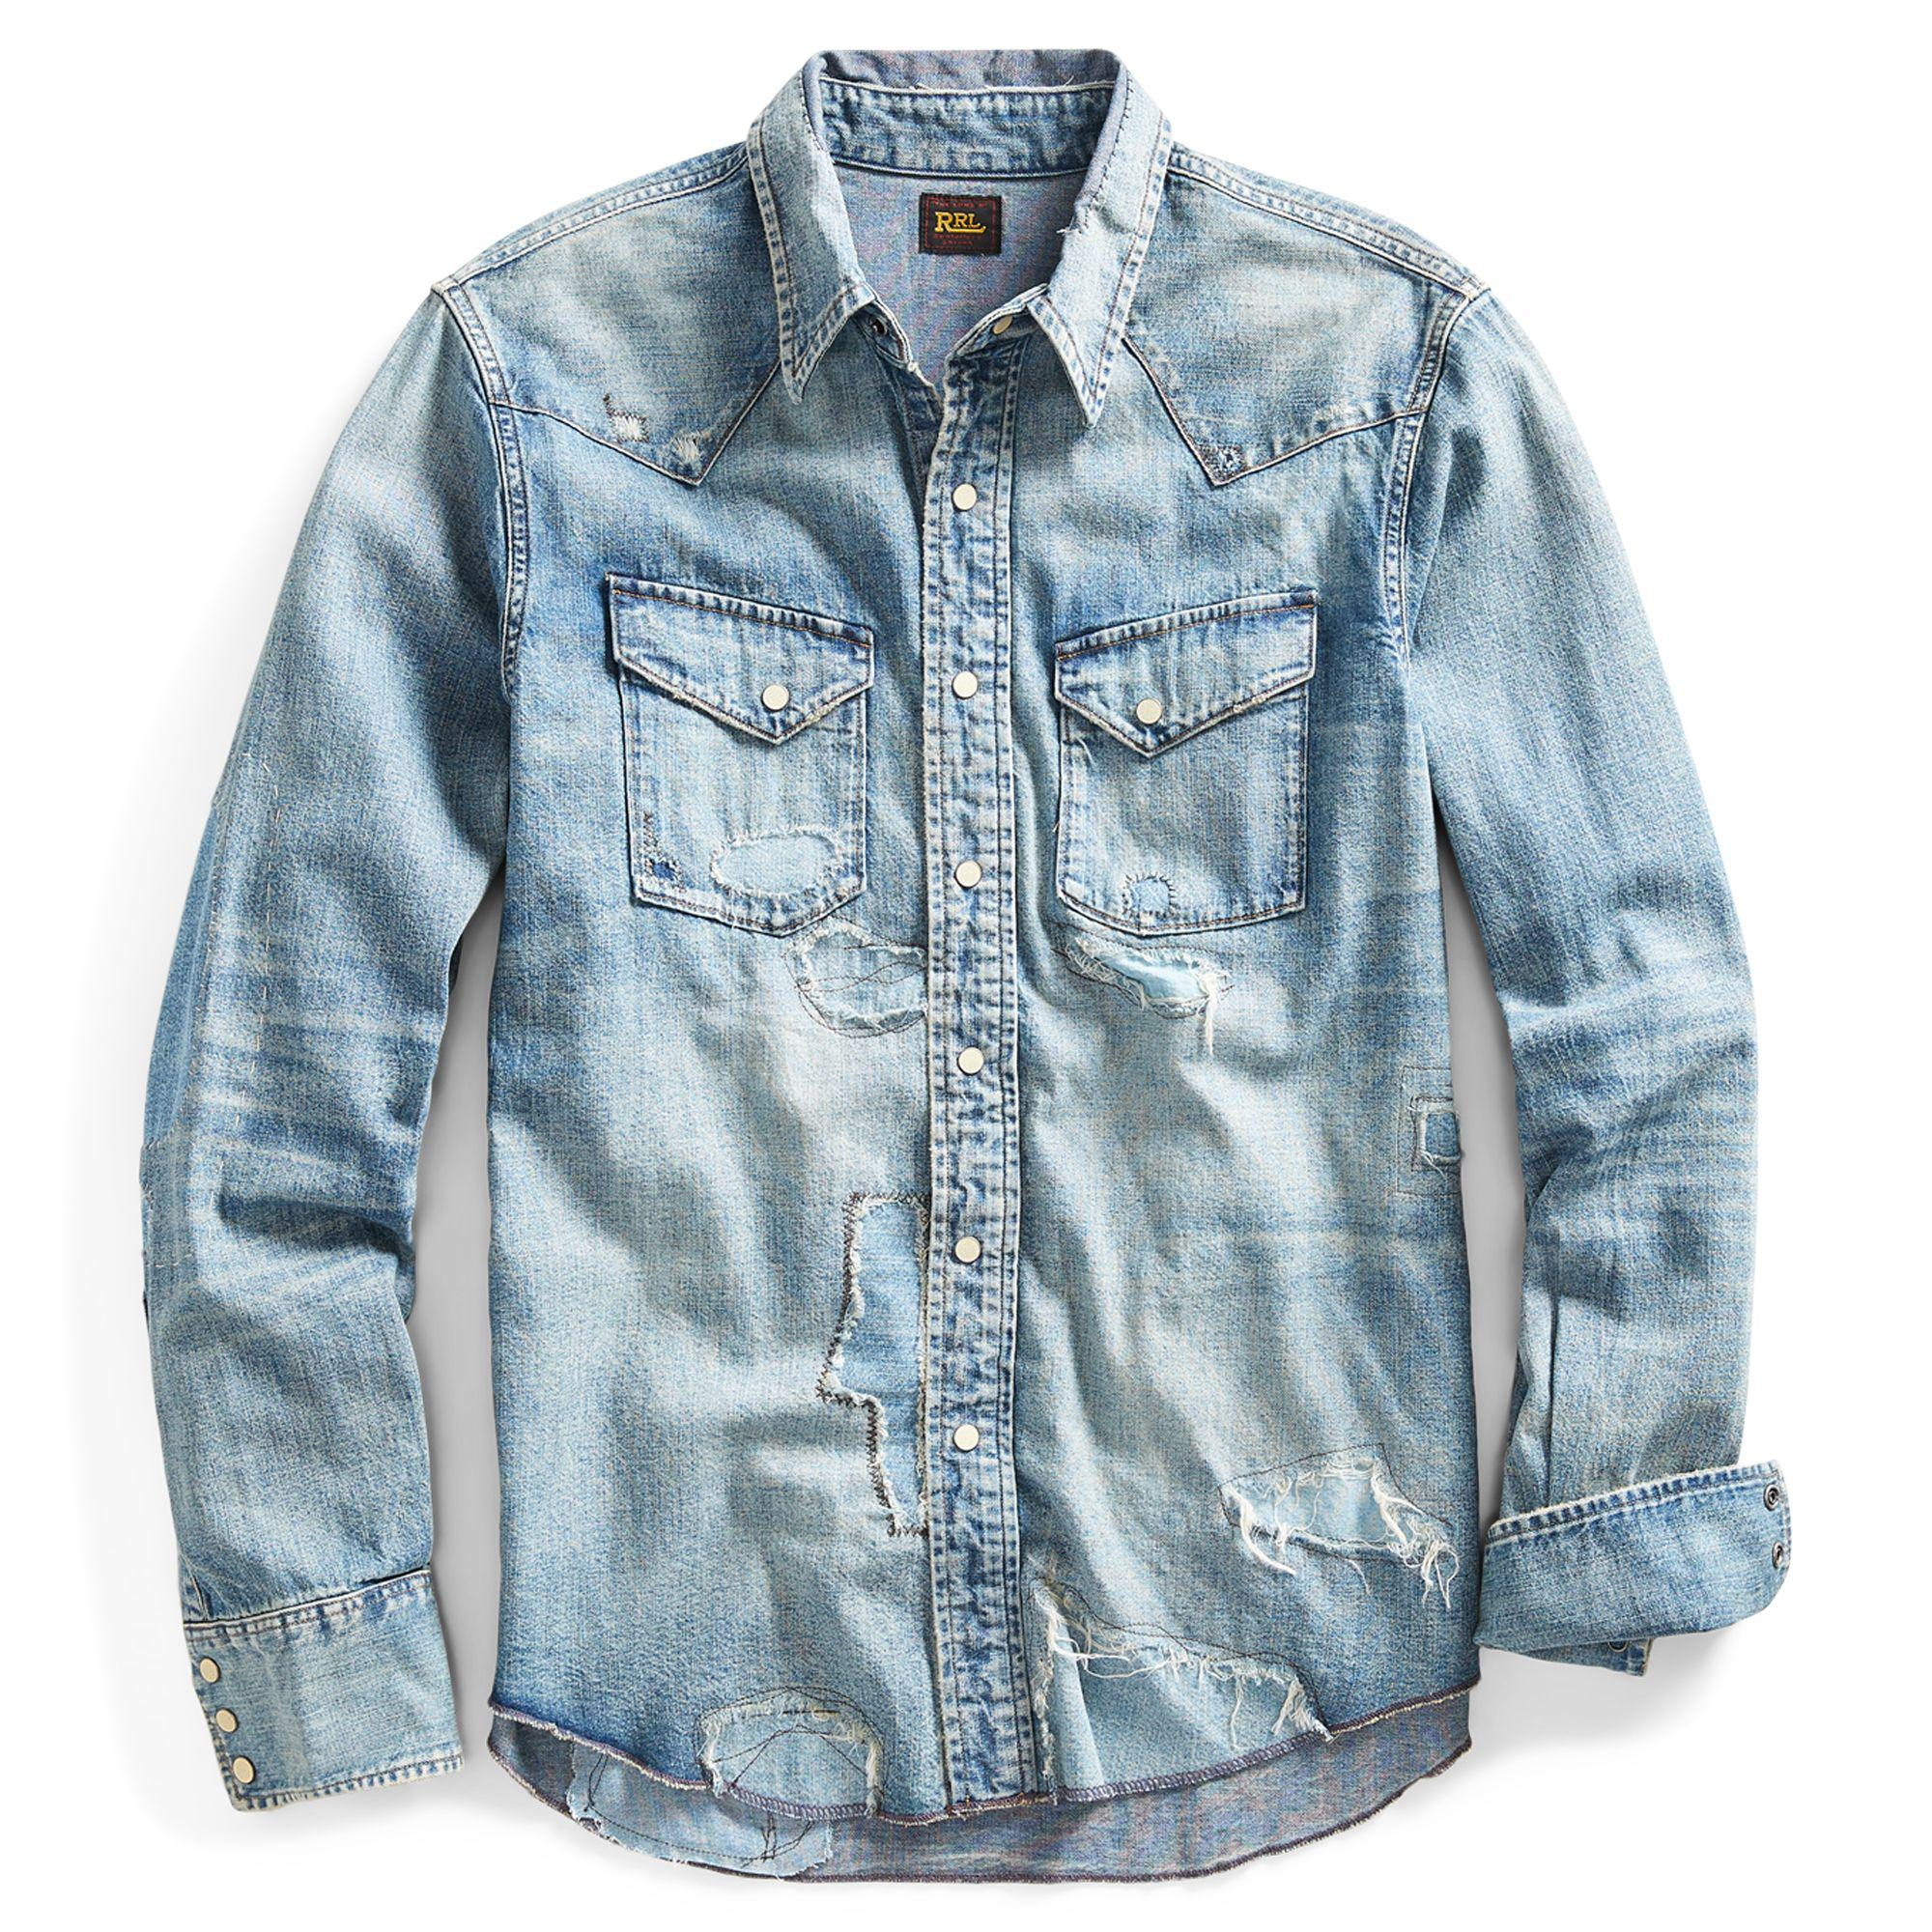 737036b1 RRL Distressed Denim Western Shirt in Blue for Men - Lyst